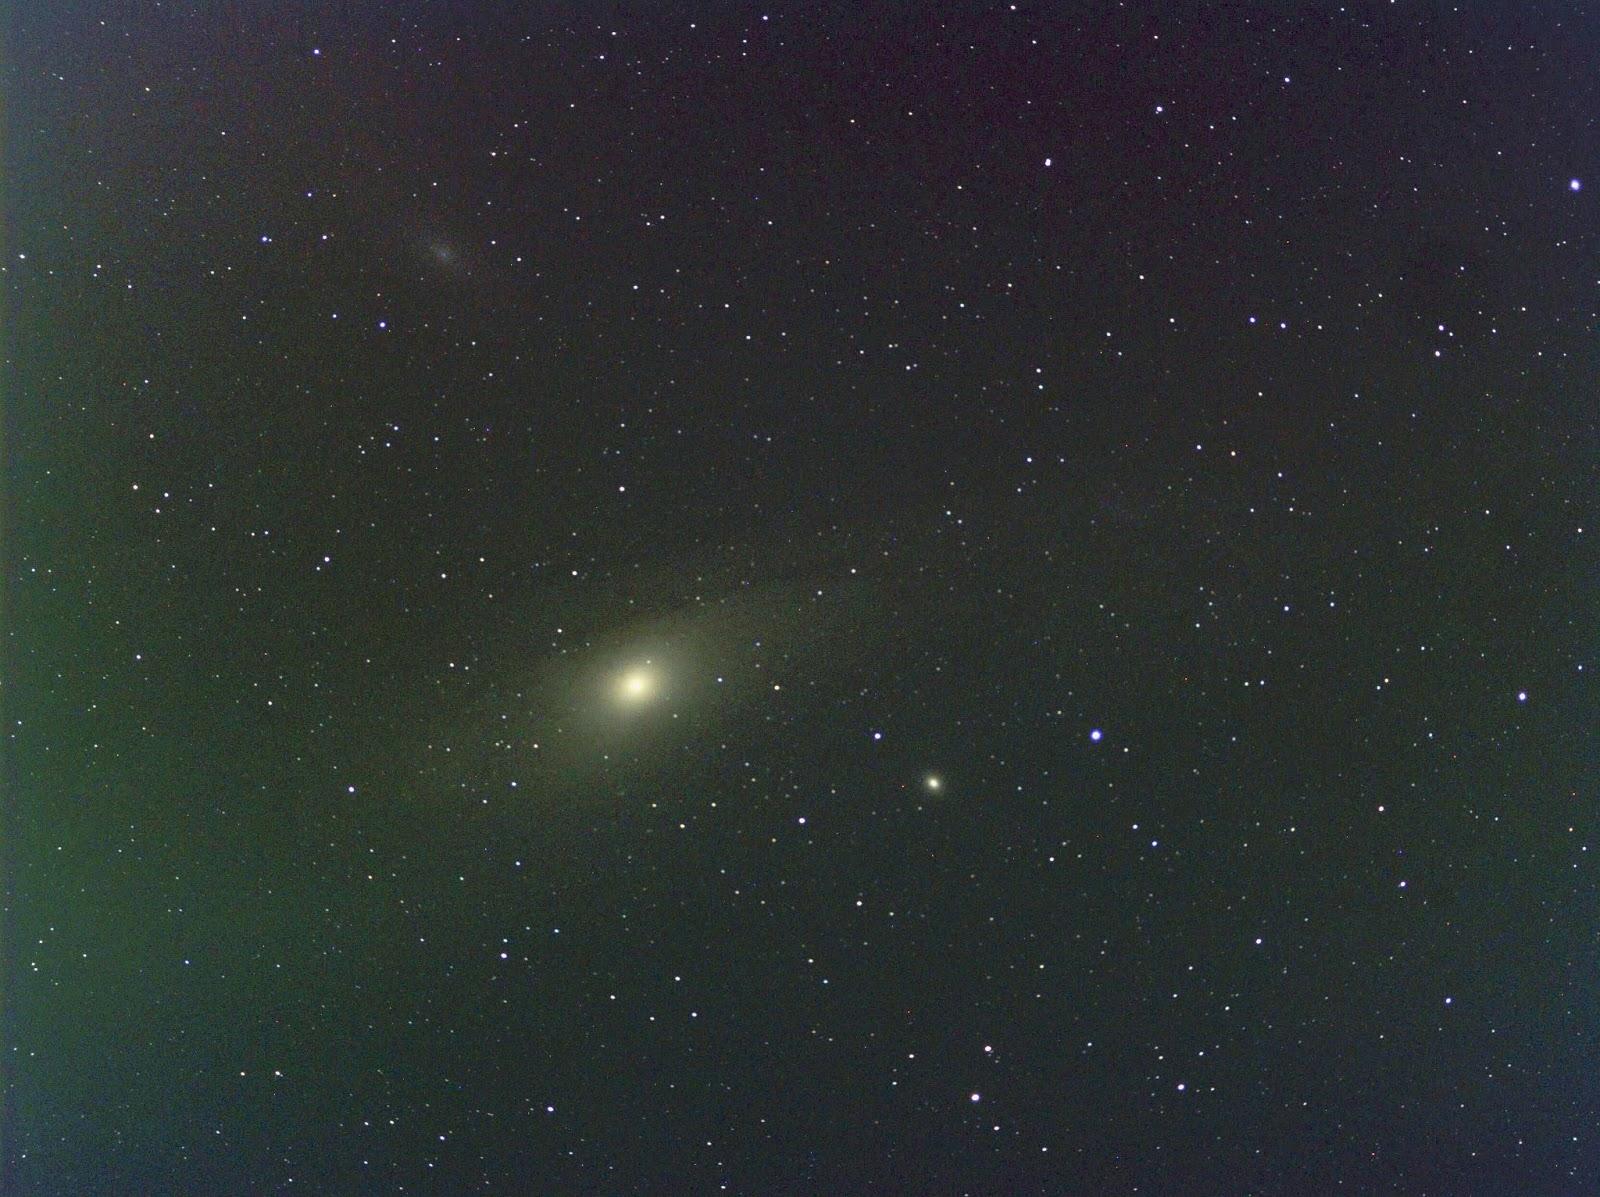 andromeda galaxy through telescope - HD1600×1197